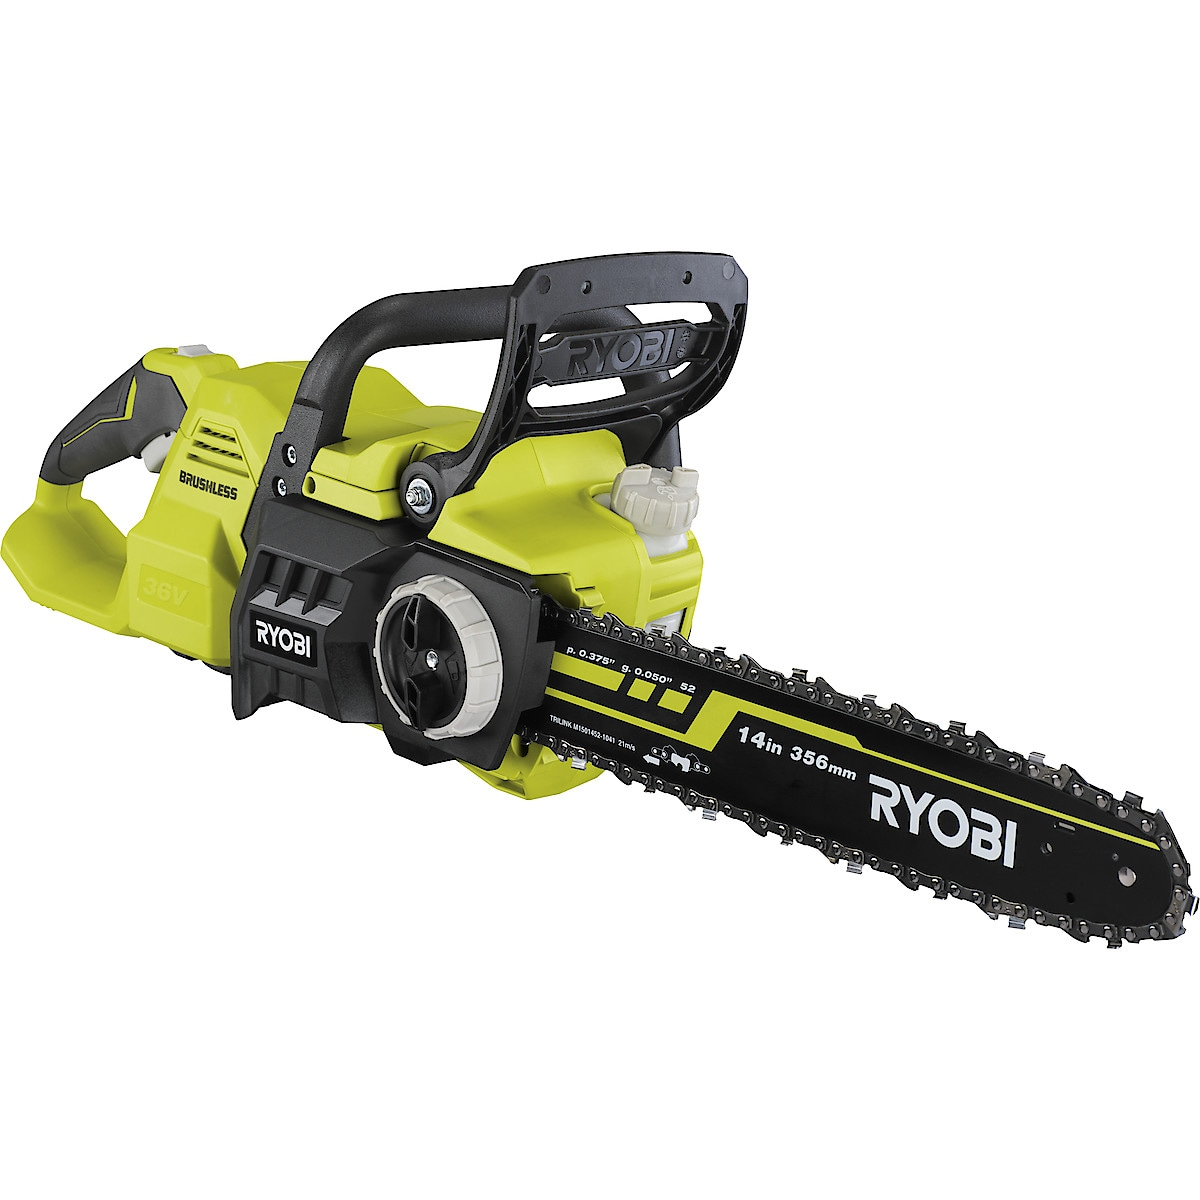 Ryobi motorsåg RY36CSX35A-0